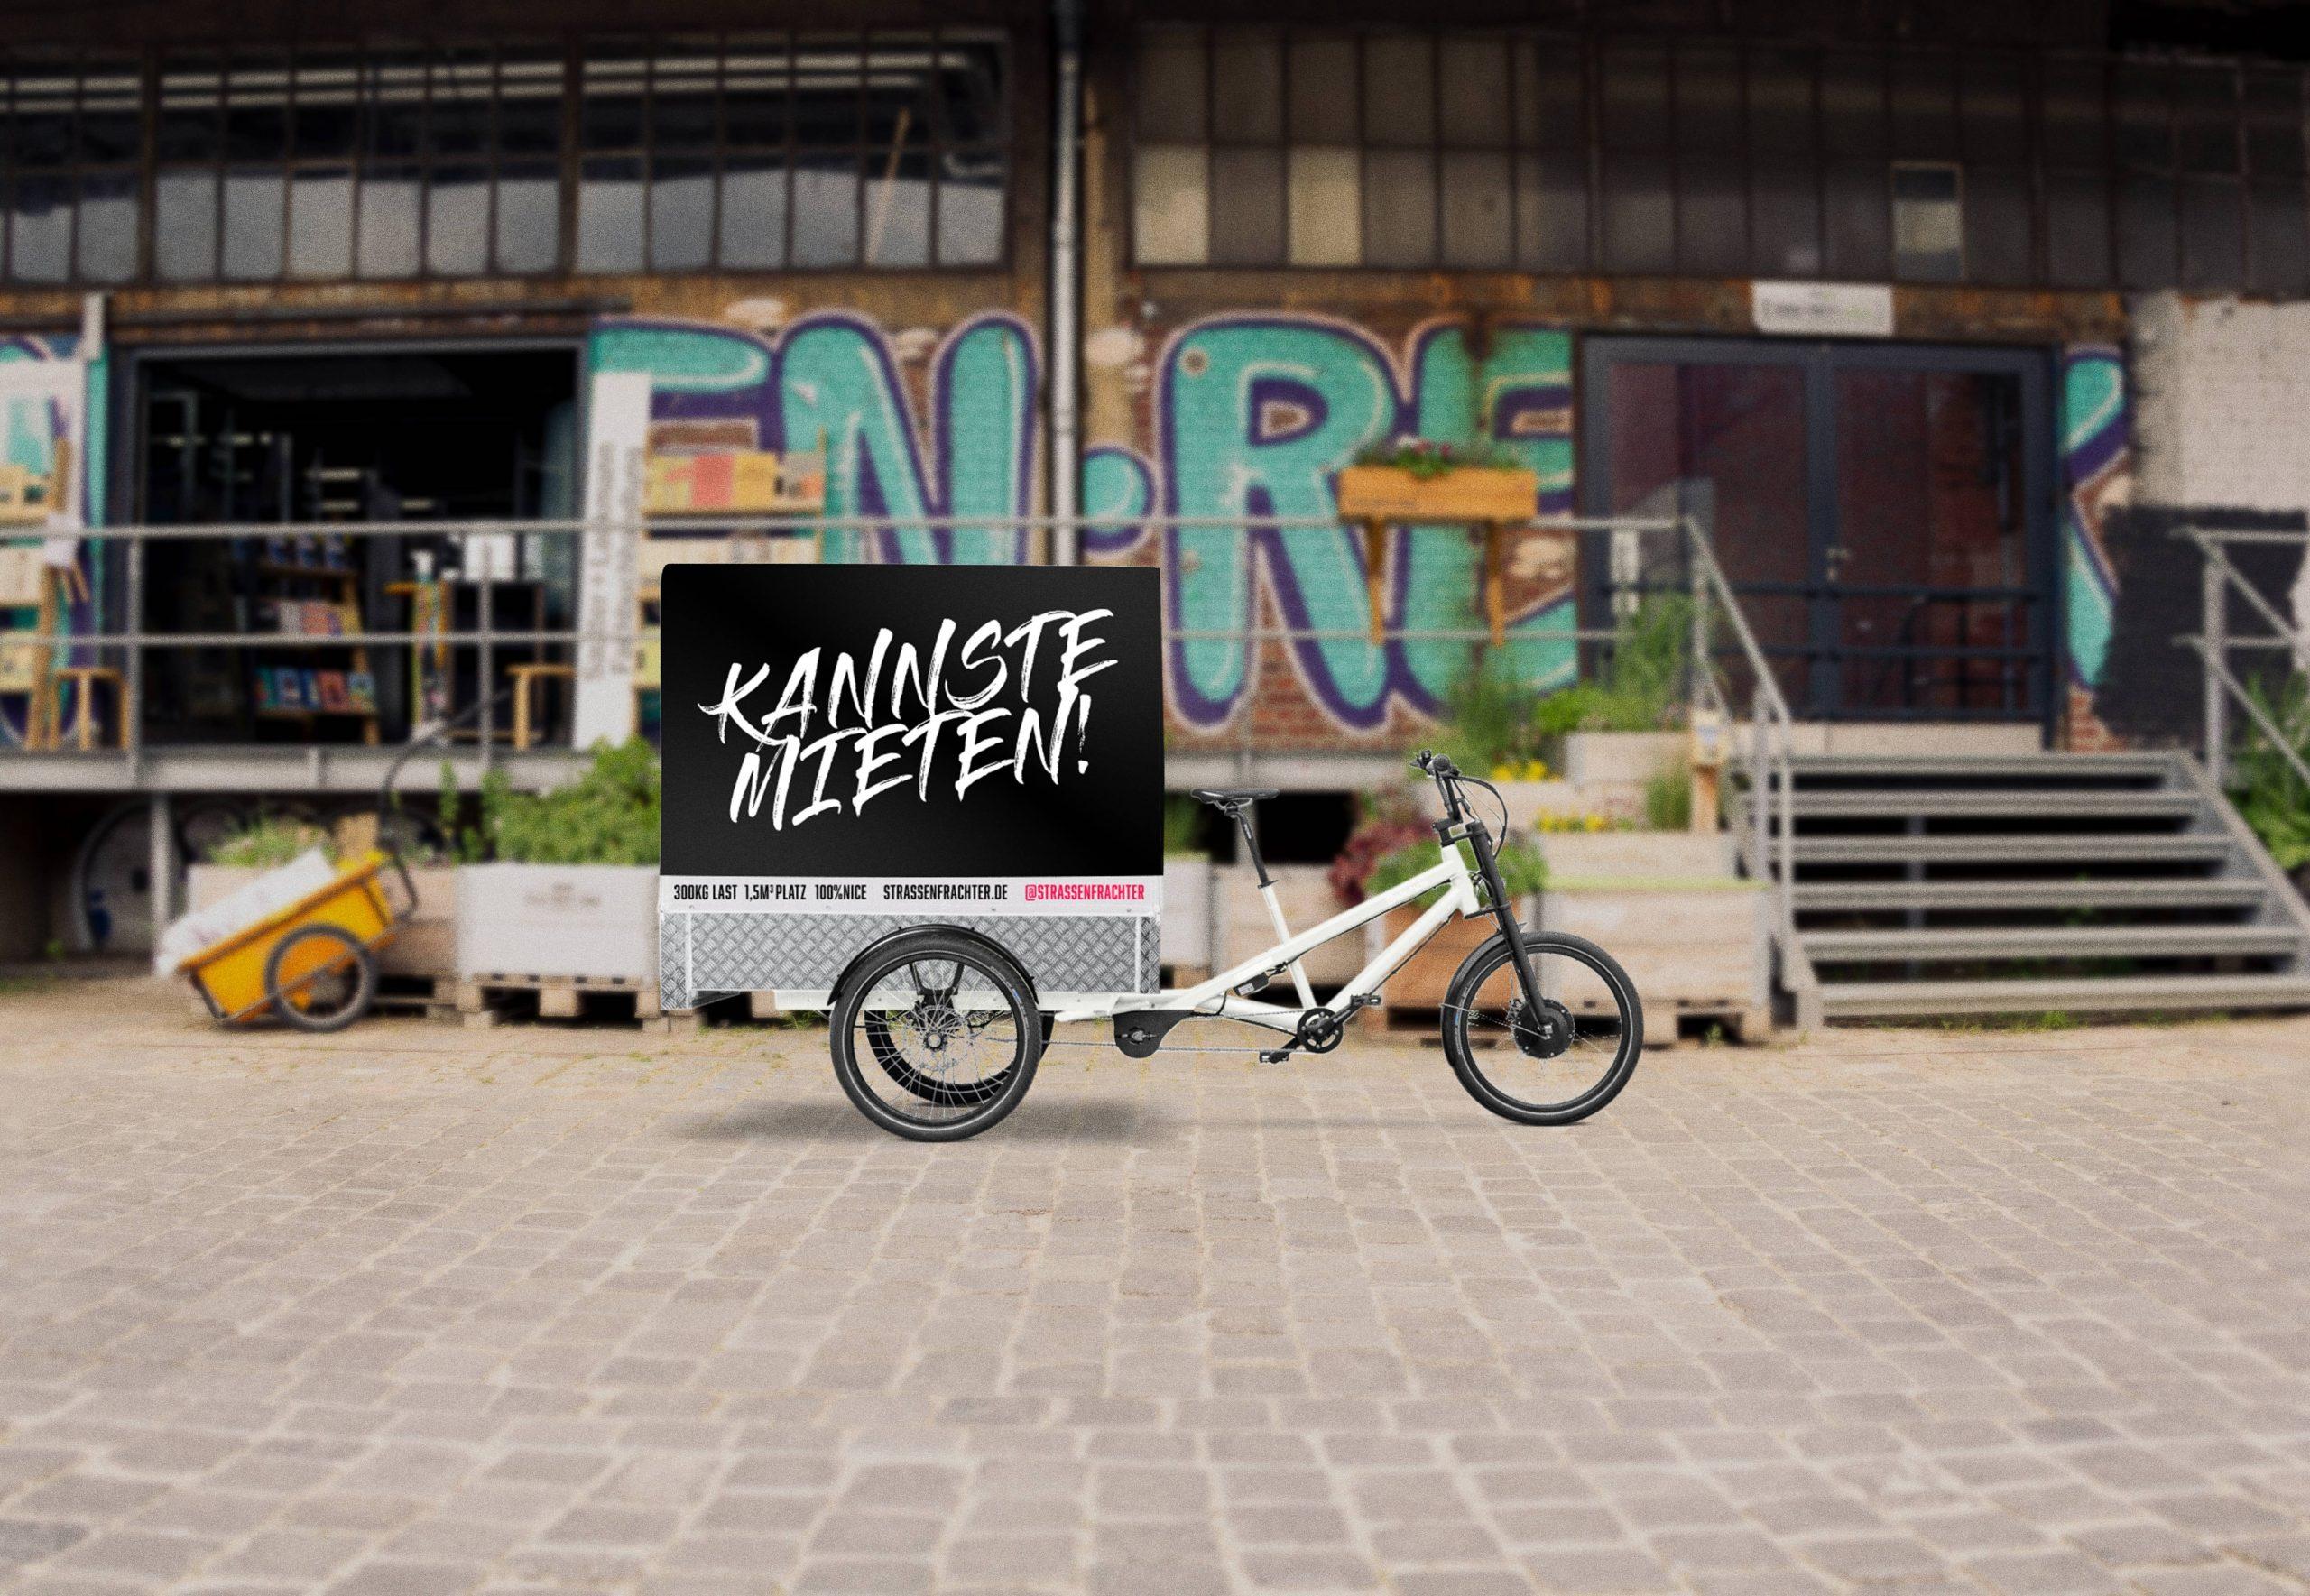 Straßenfrachter Lastenrad Miete Hamburg Corwdfunding